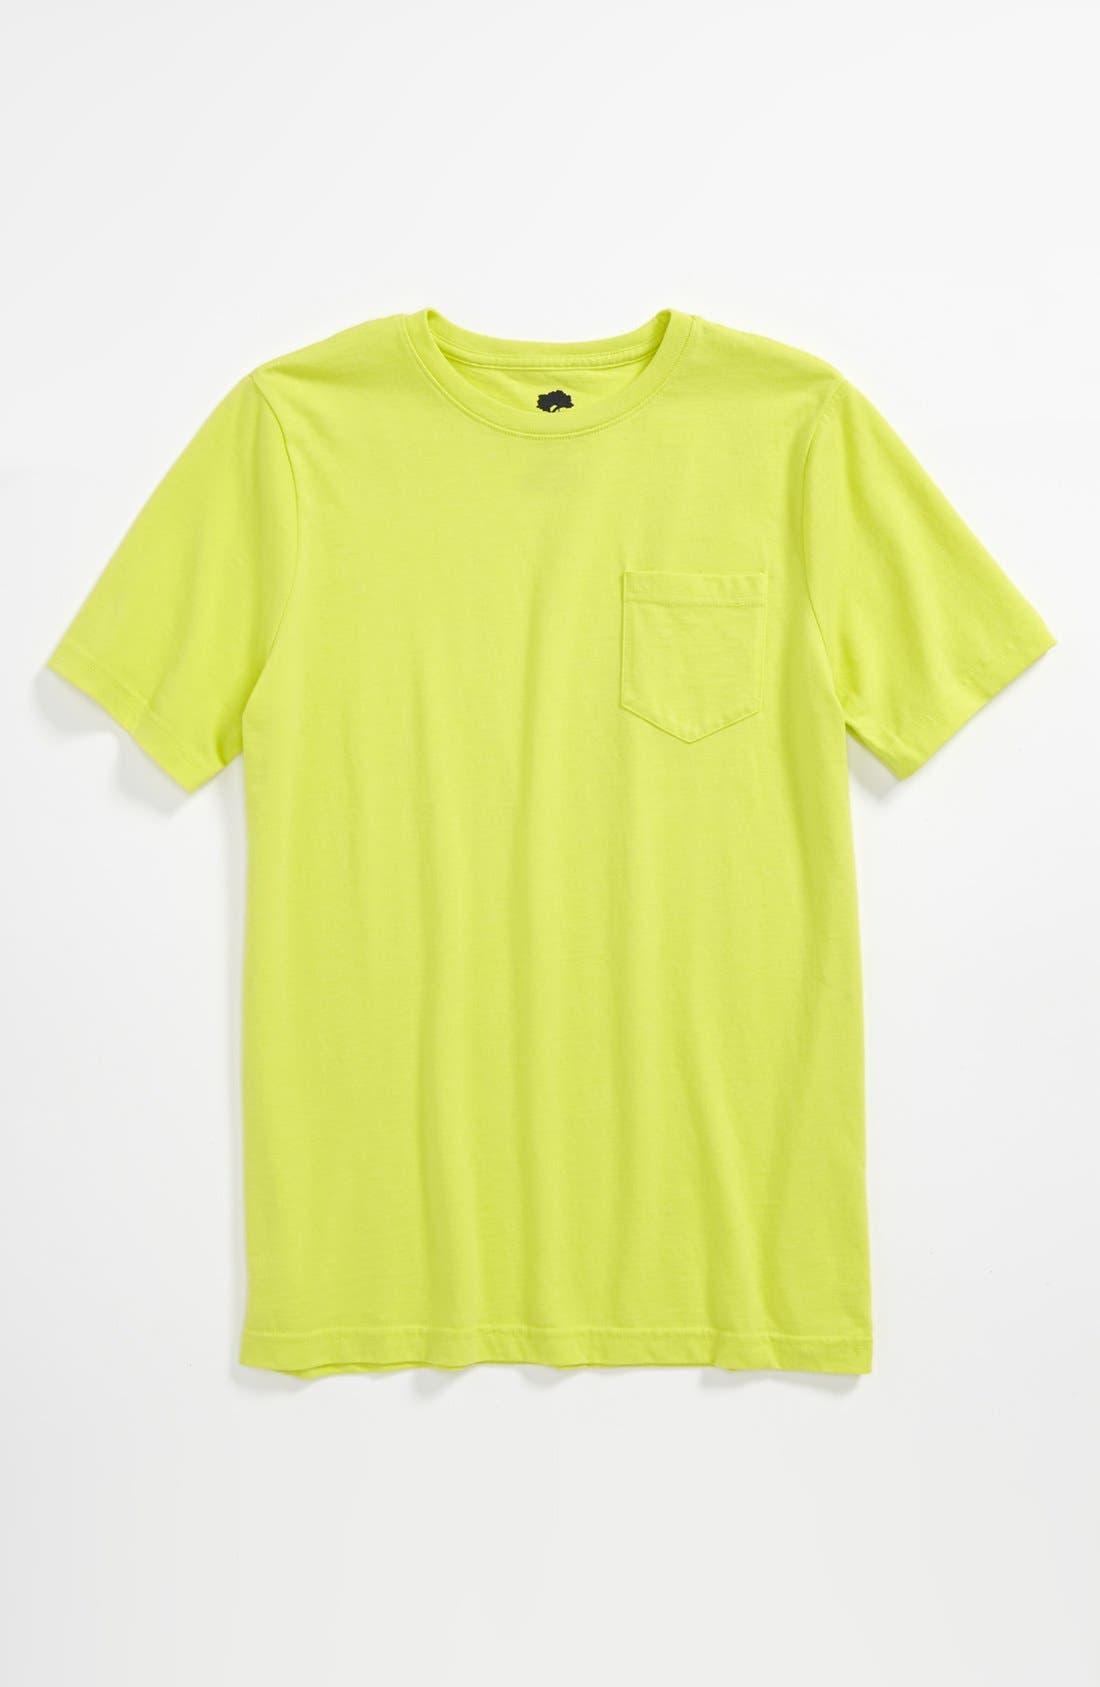 Alternate Image 1 Selected - Tucker + Tate 'Westlake' T-Shirt (Big Boys)